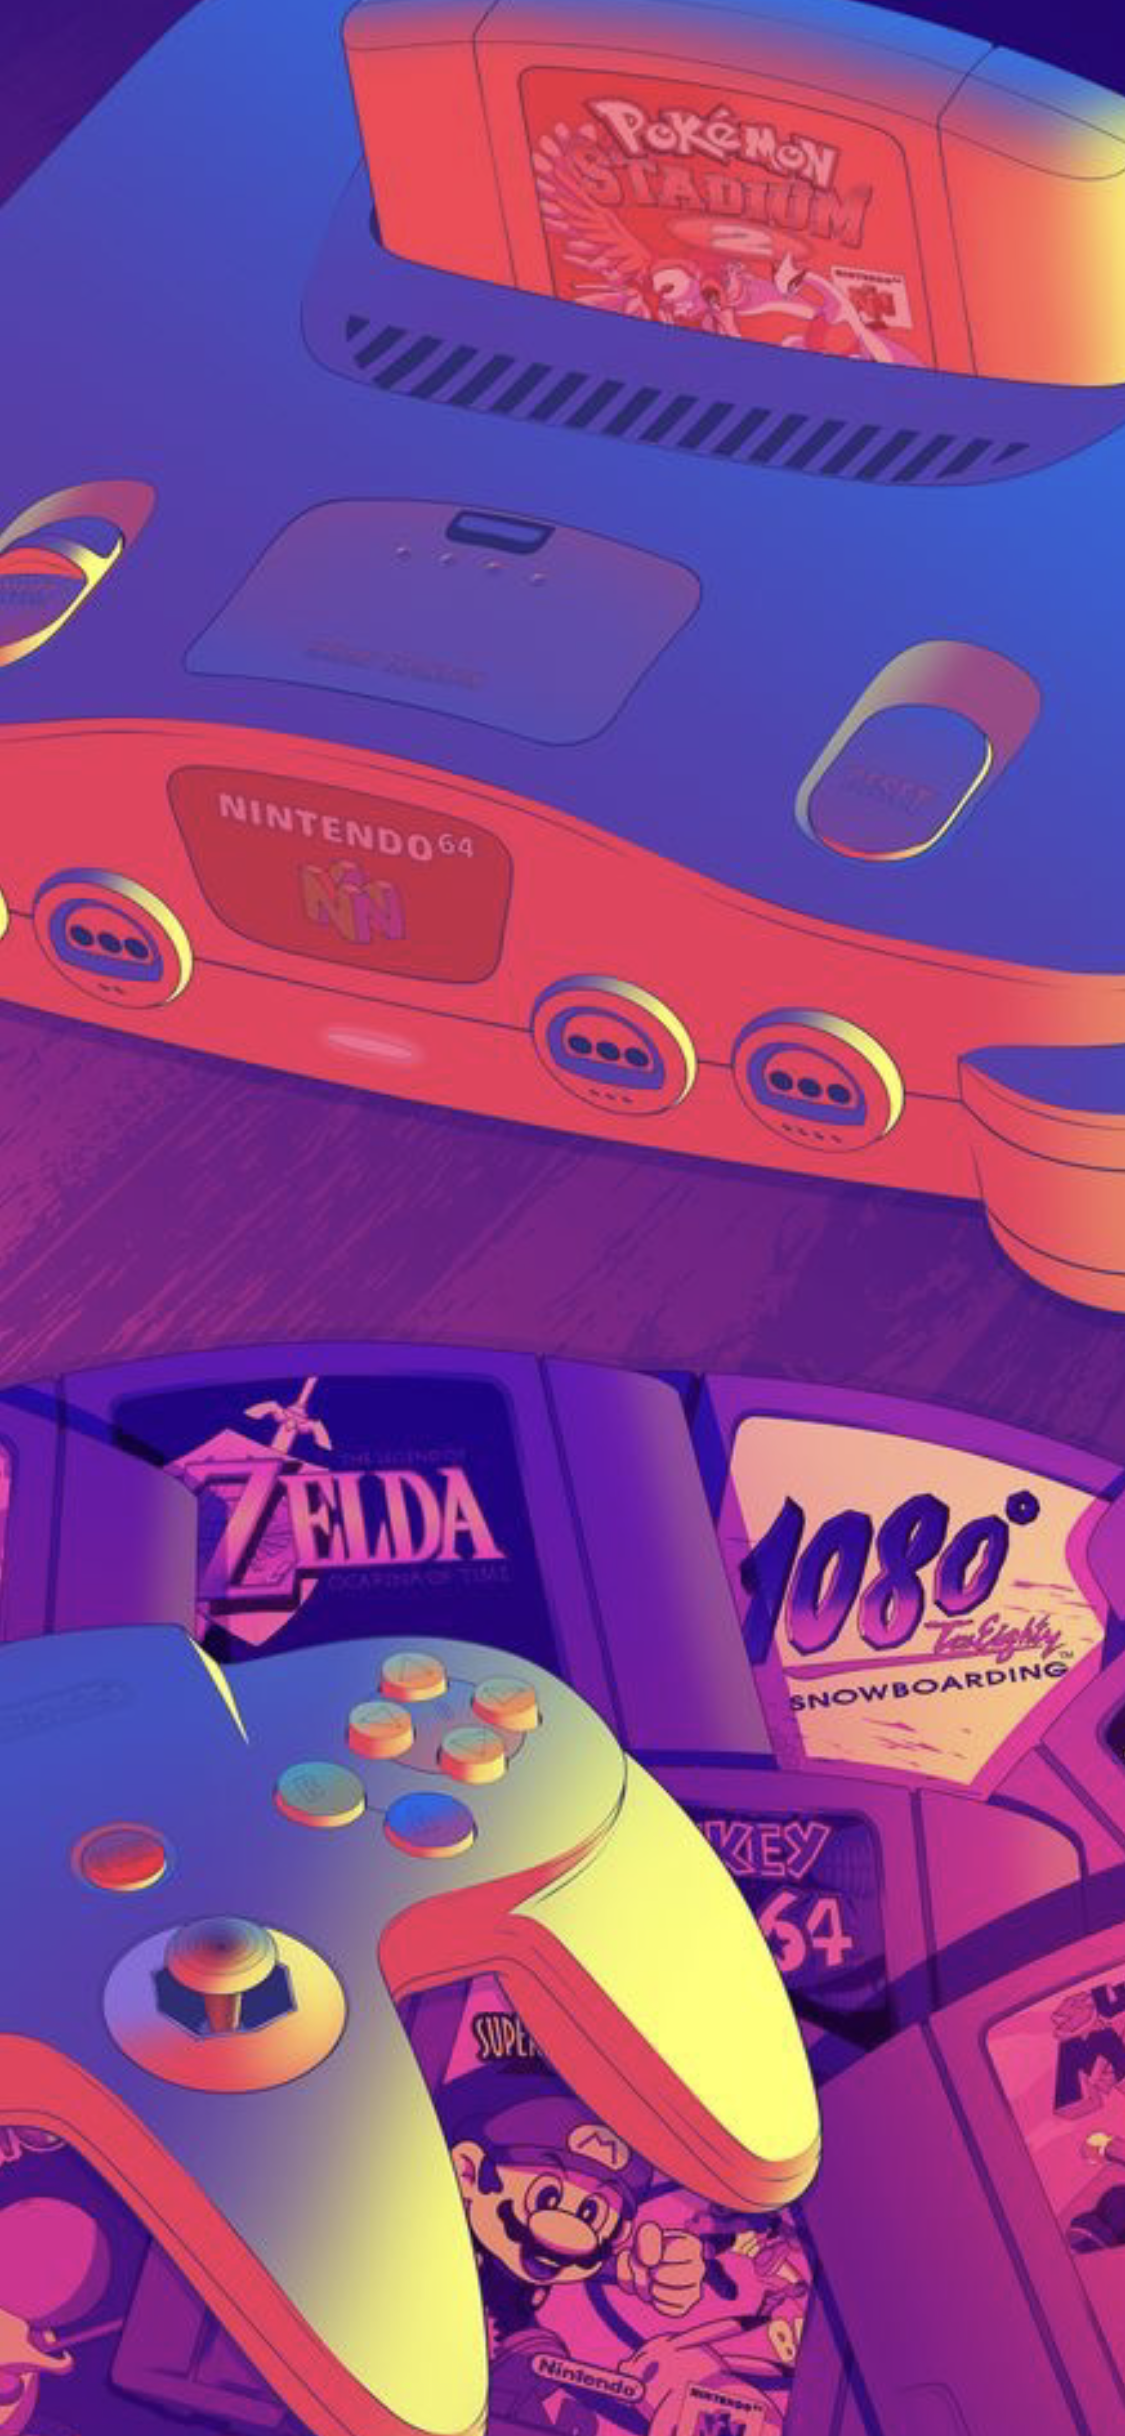 Nintendo Iphone Wallpapers Top Free Nintendo Iphone Backgrounds Wallpaperaccess